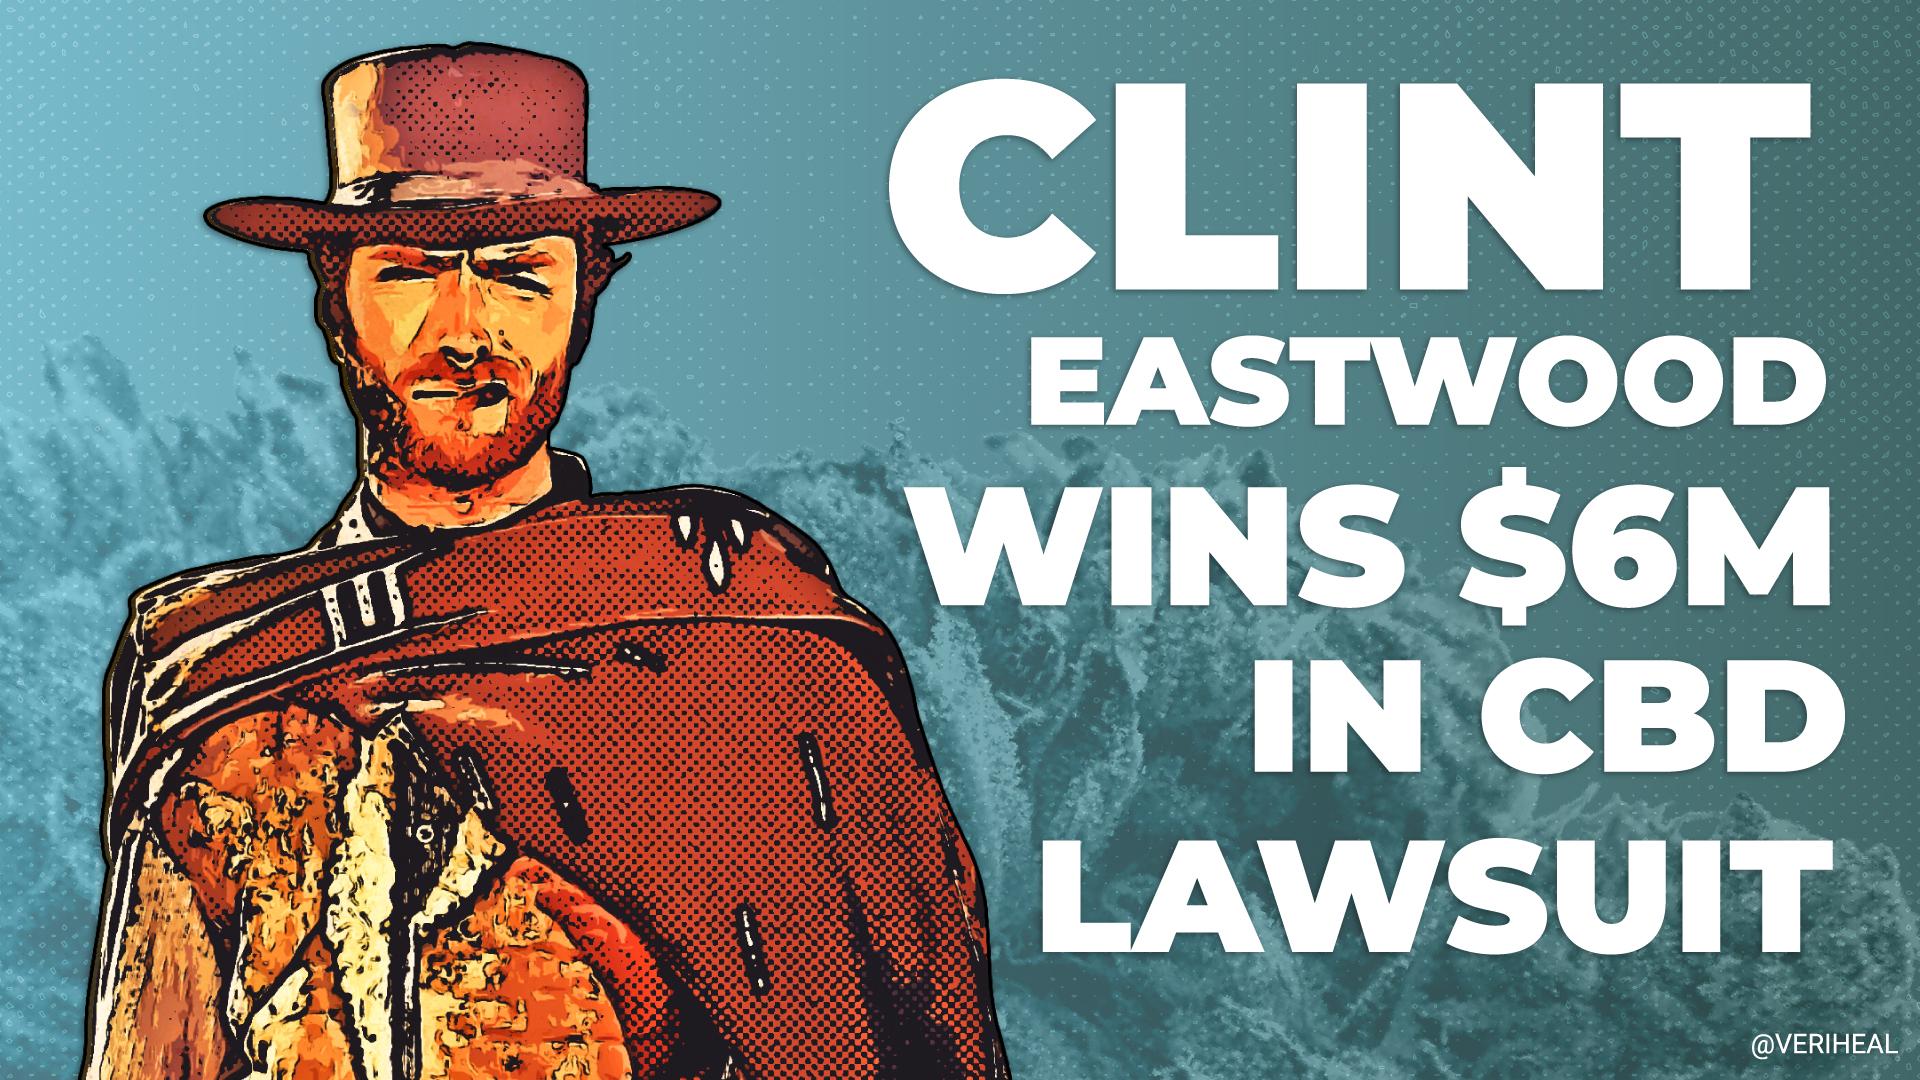 Clint Eastwood Wins $6.1 Million for Fake CBD Endorsements